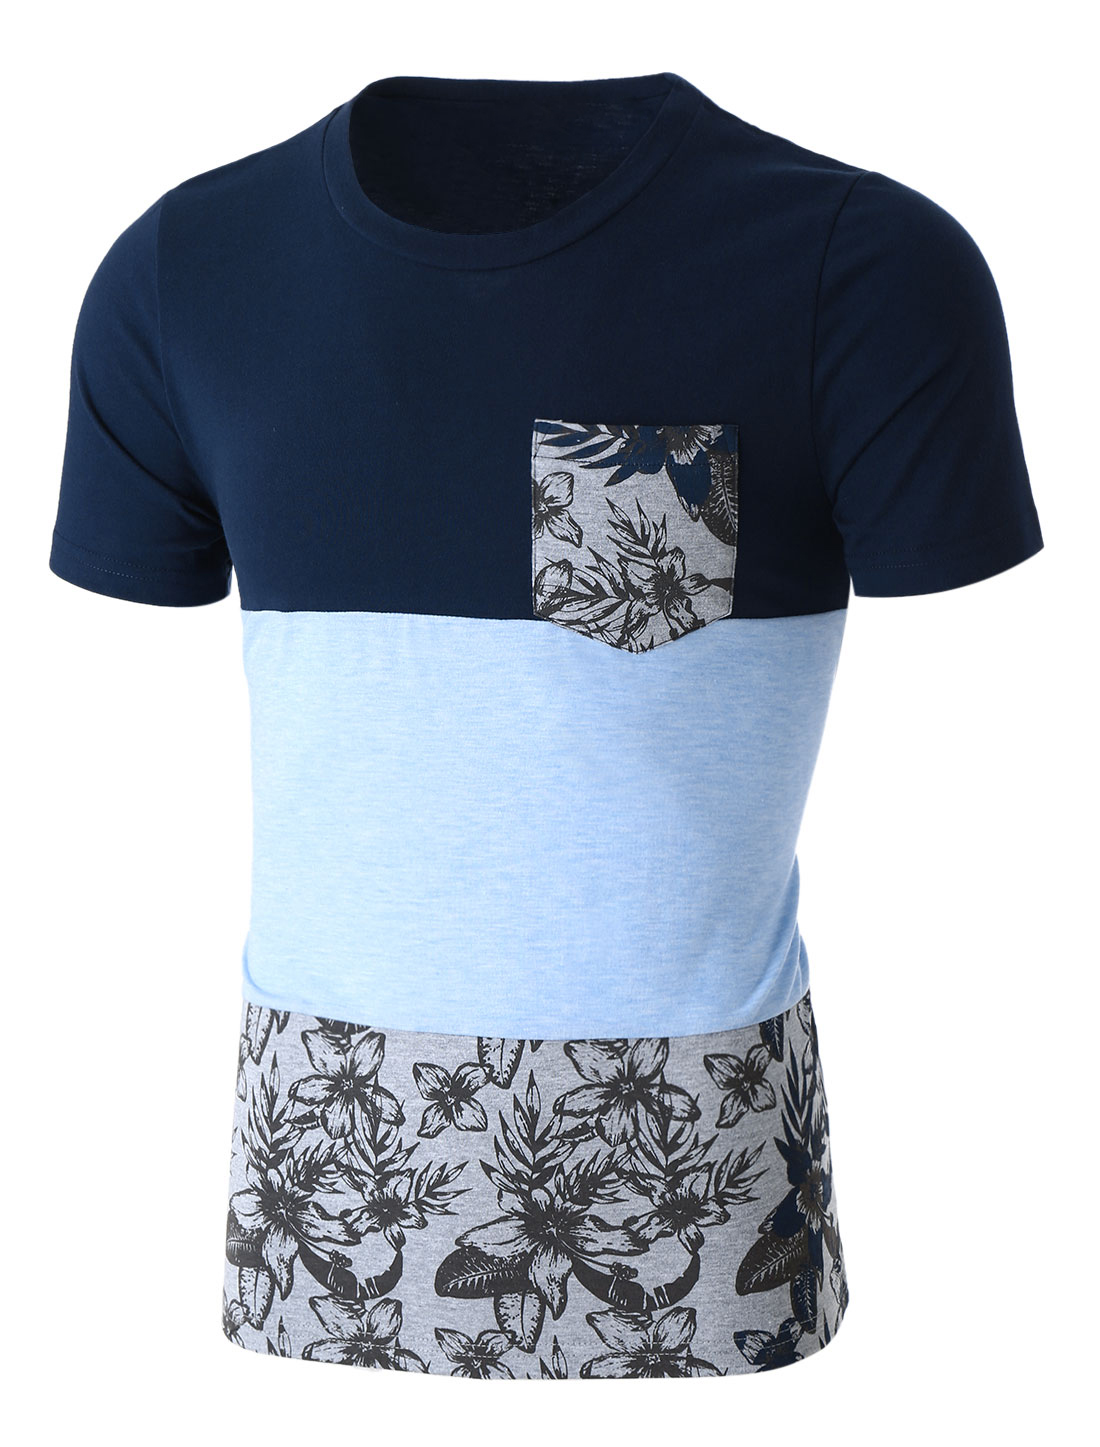 Men Short Sleeves Floral Print Color Block Crew Neck Tee Blue L